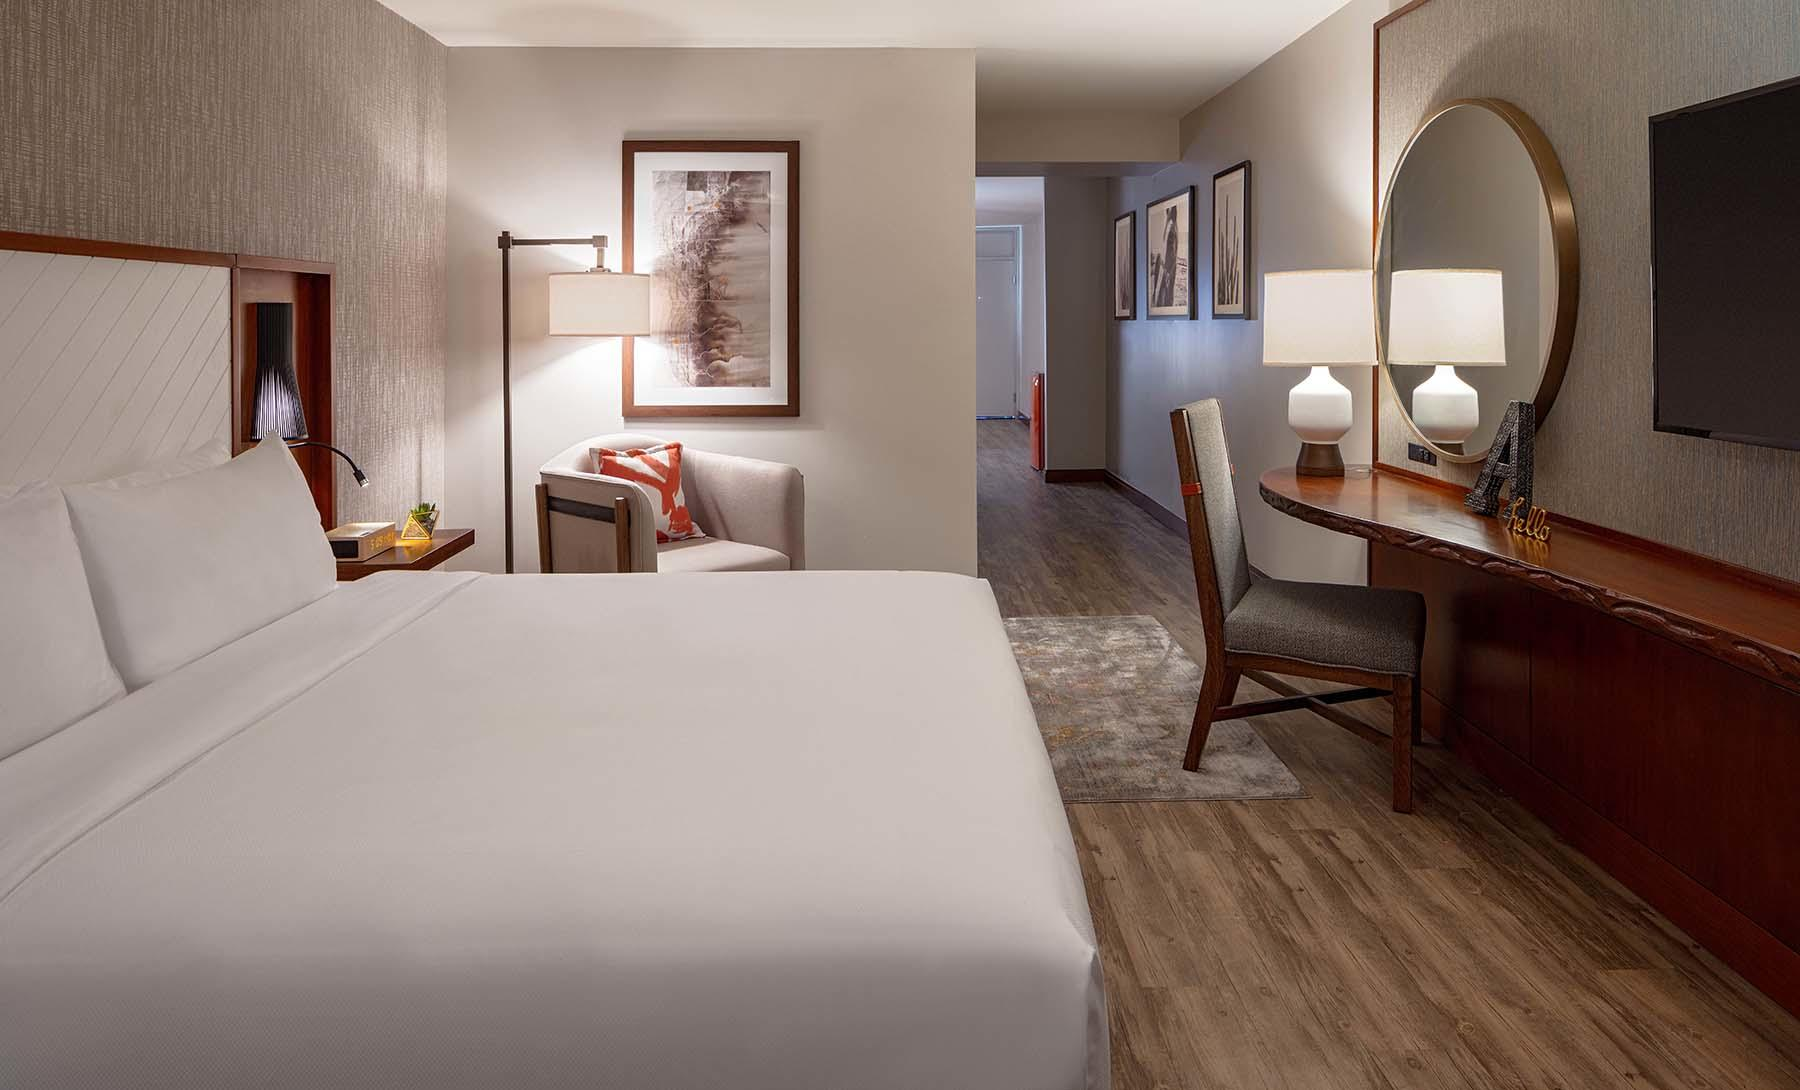 Hotel Adeline image 33